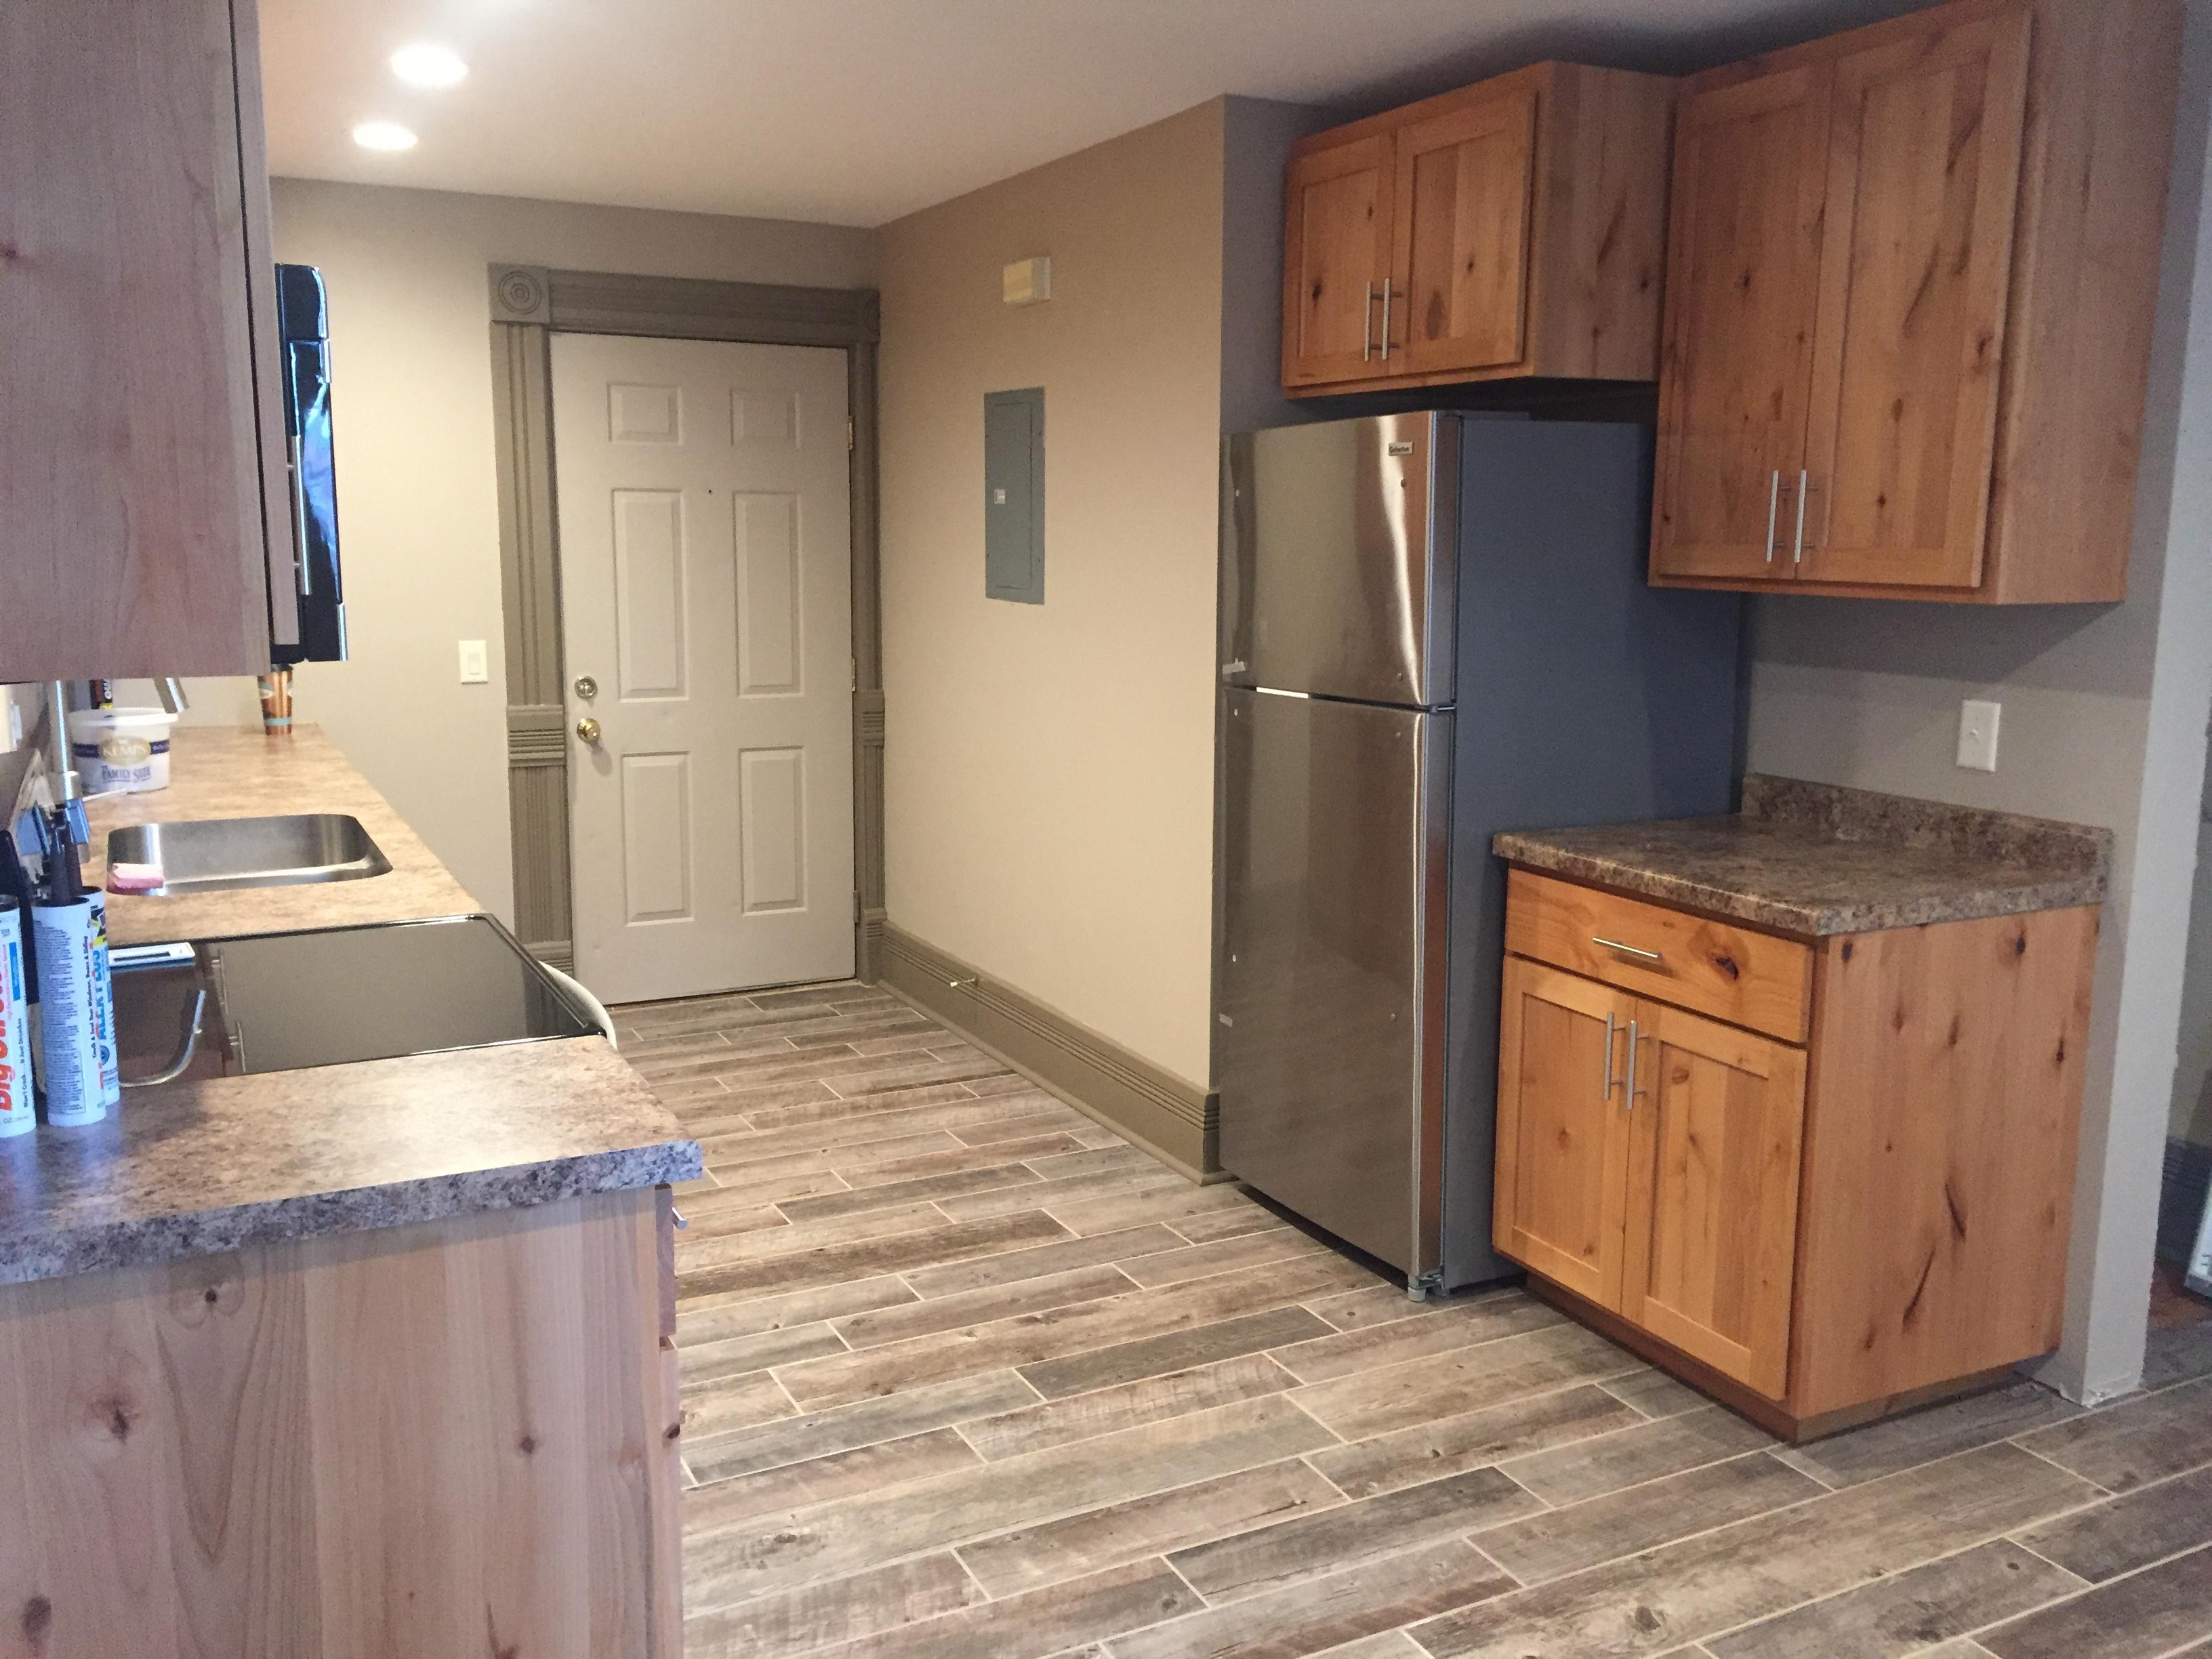 135 Lafayette 4 4 Bedroom Downtown Winona Apartment